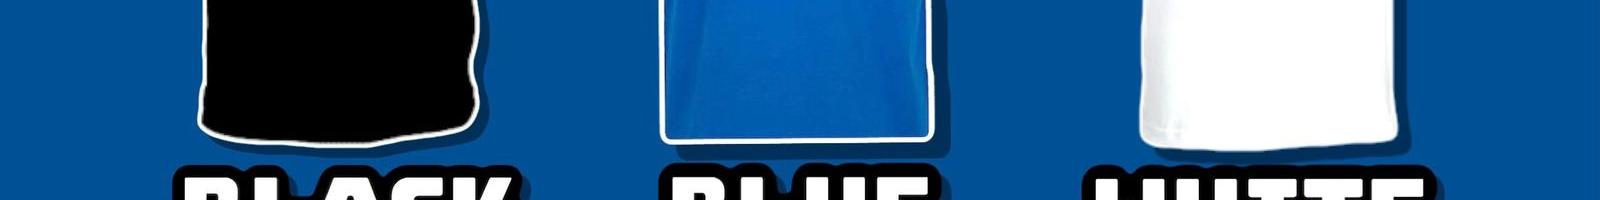 Spezialshirt | Limitiert | Sonderedition